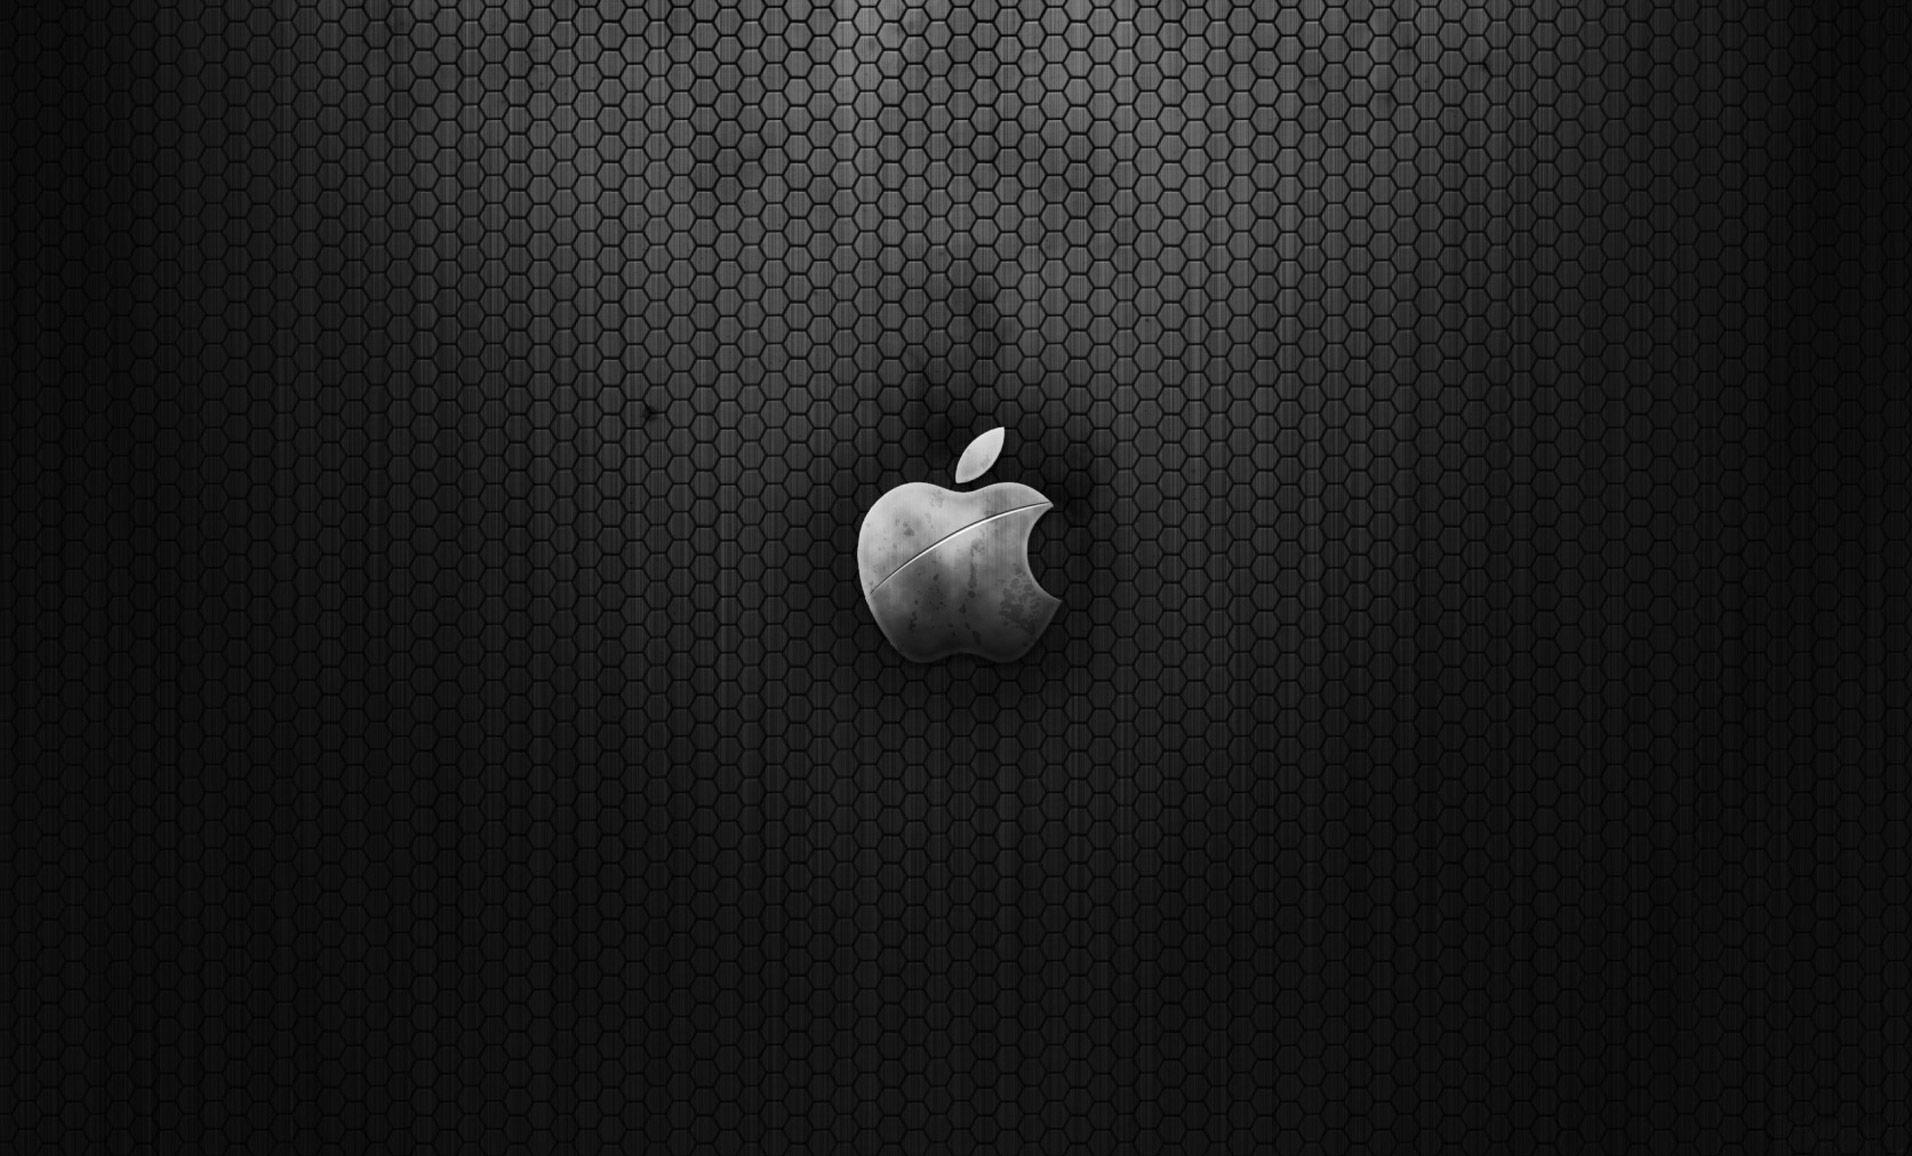 computer wallpaper download Apple Computer Wallpaper 1912x1156